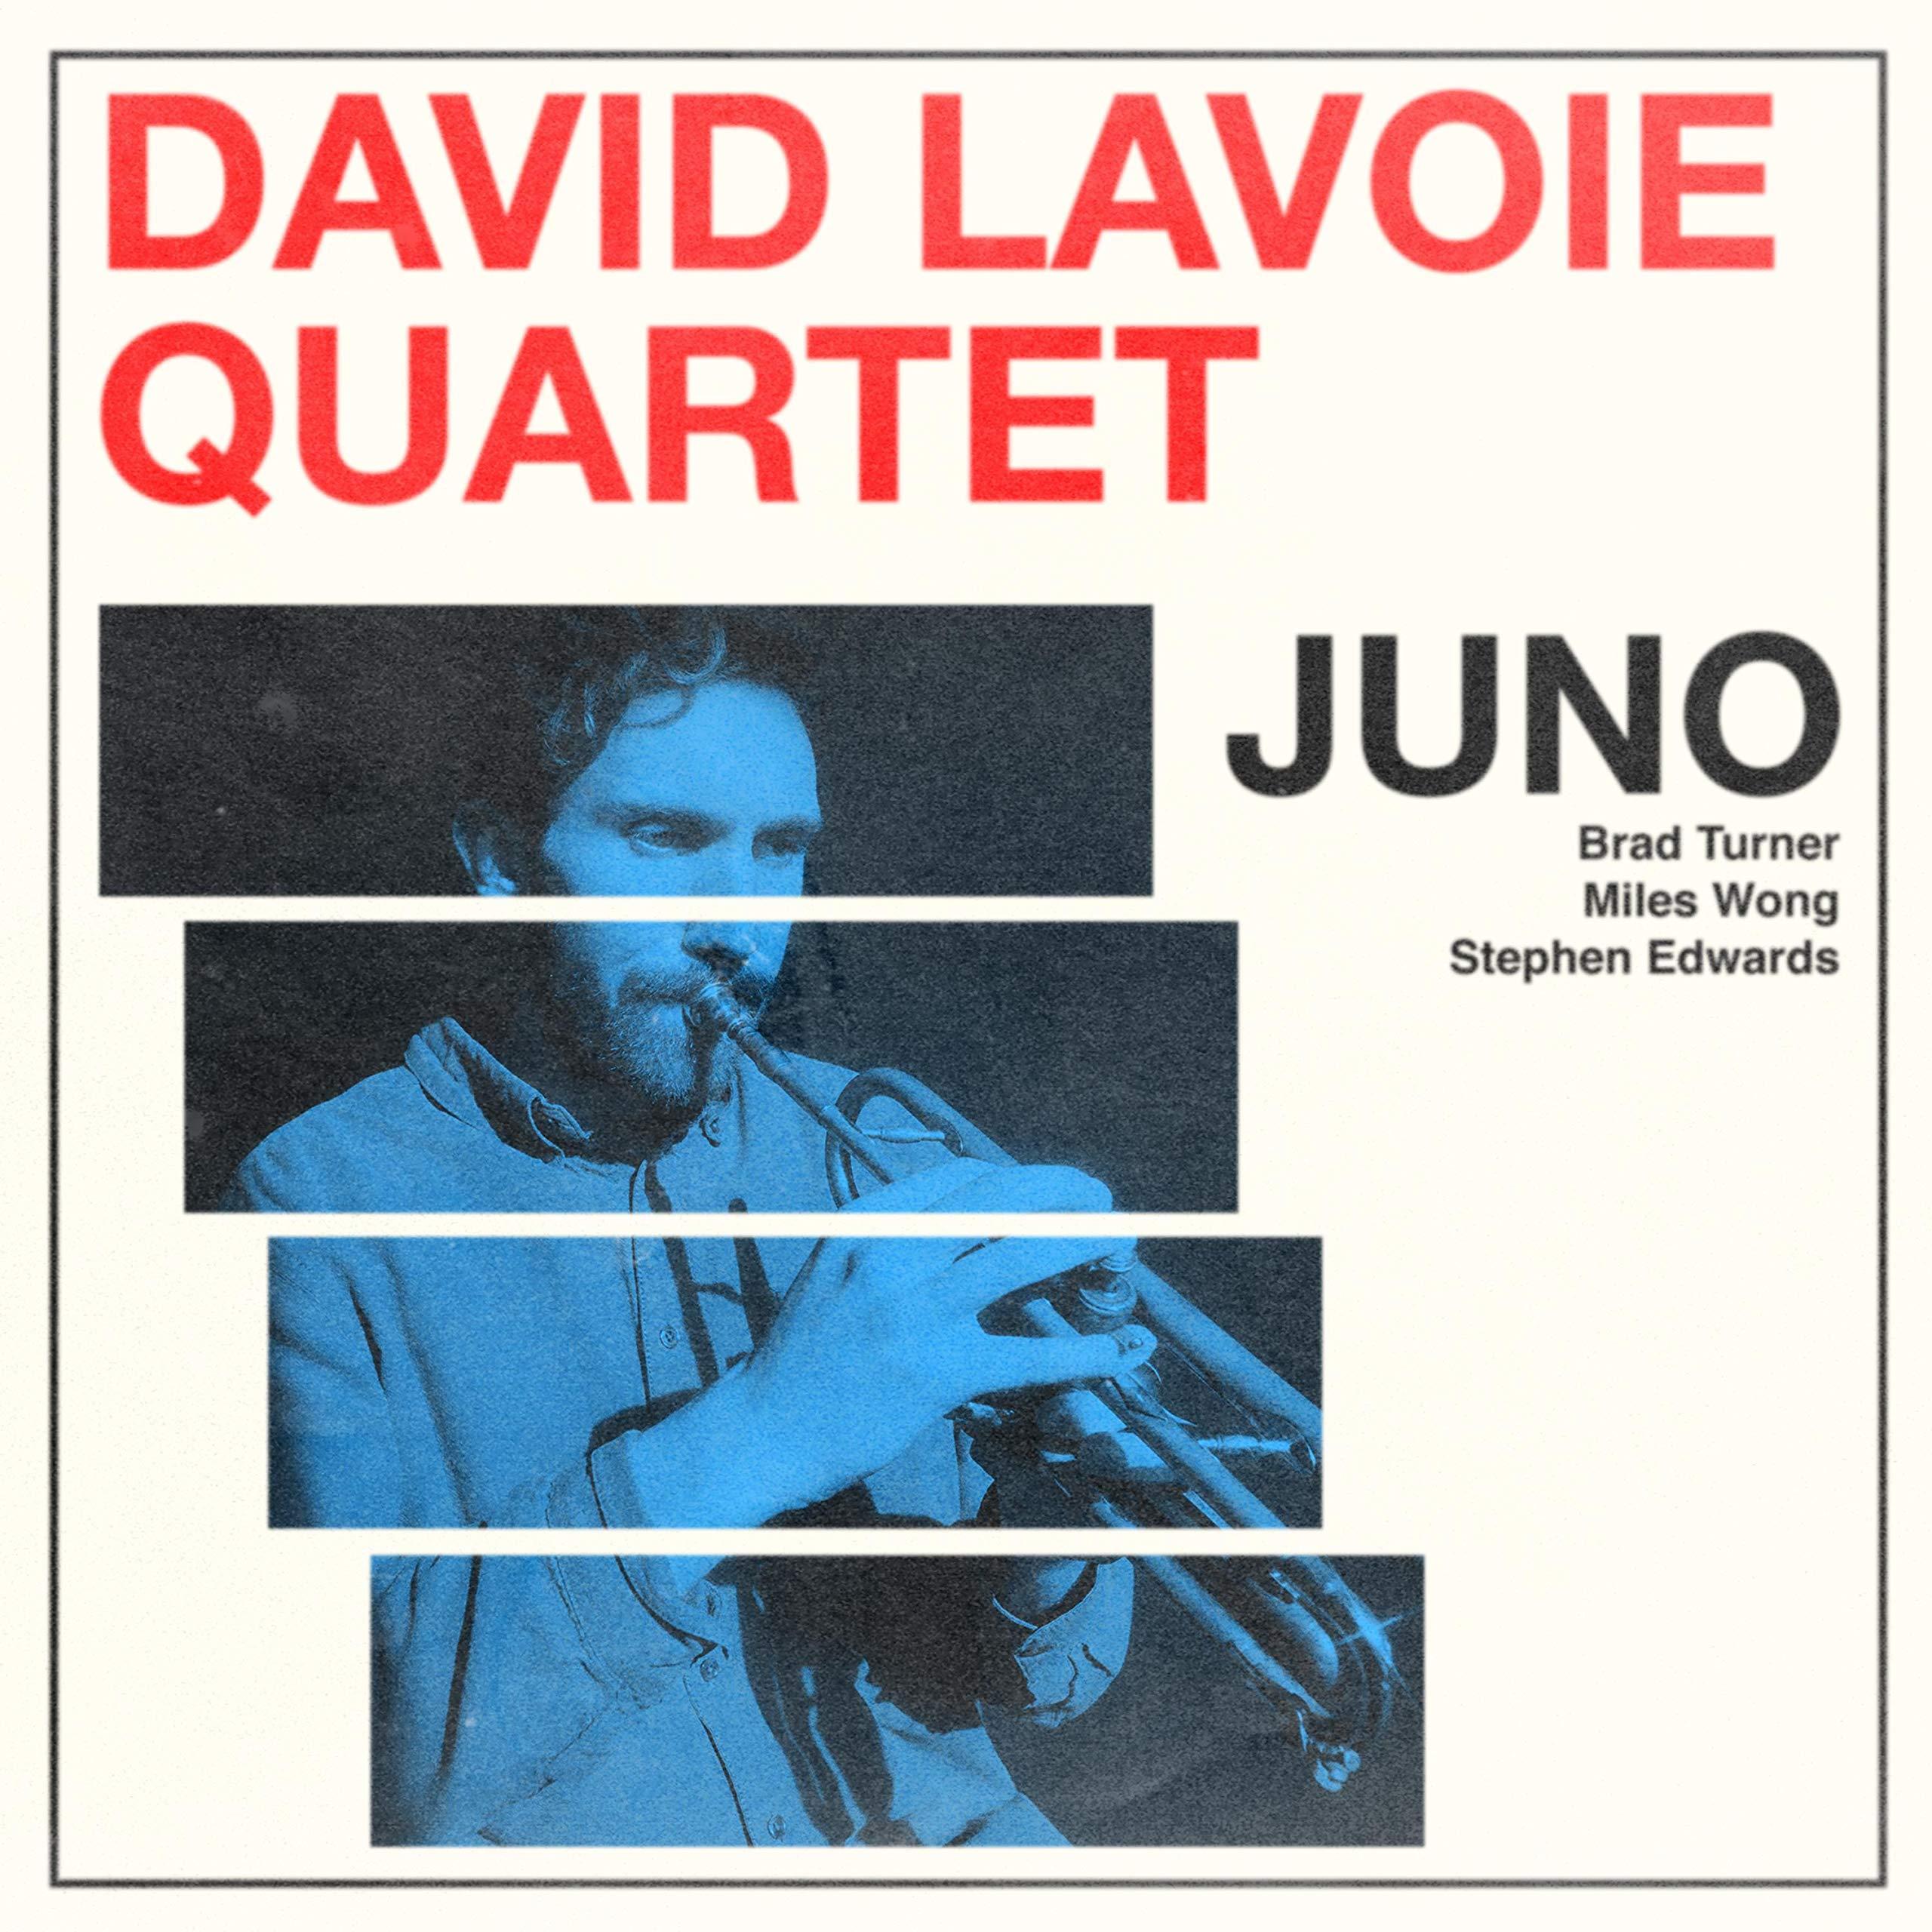 David Lavoie Quartet - Juno (2020) [FLAC] Download